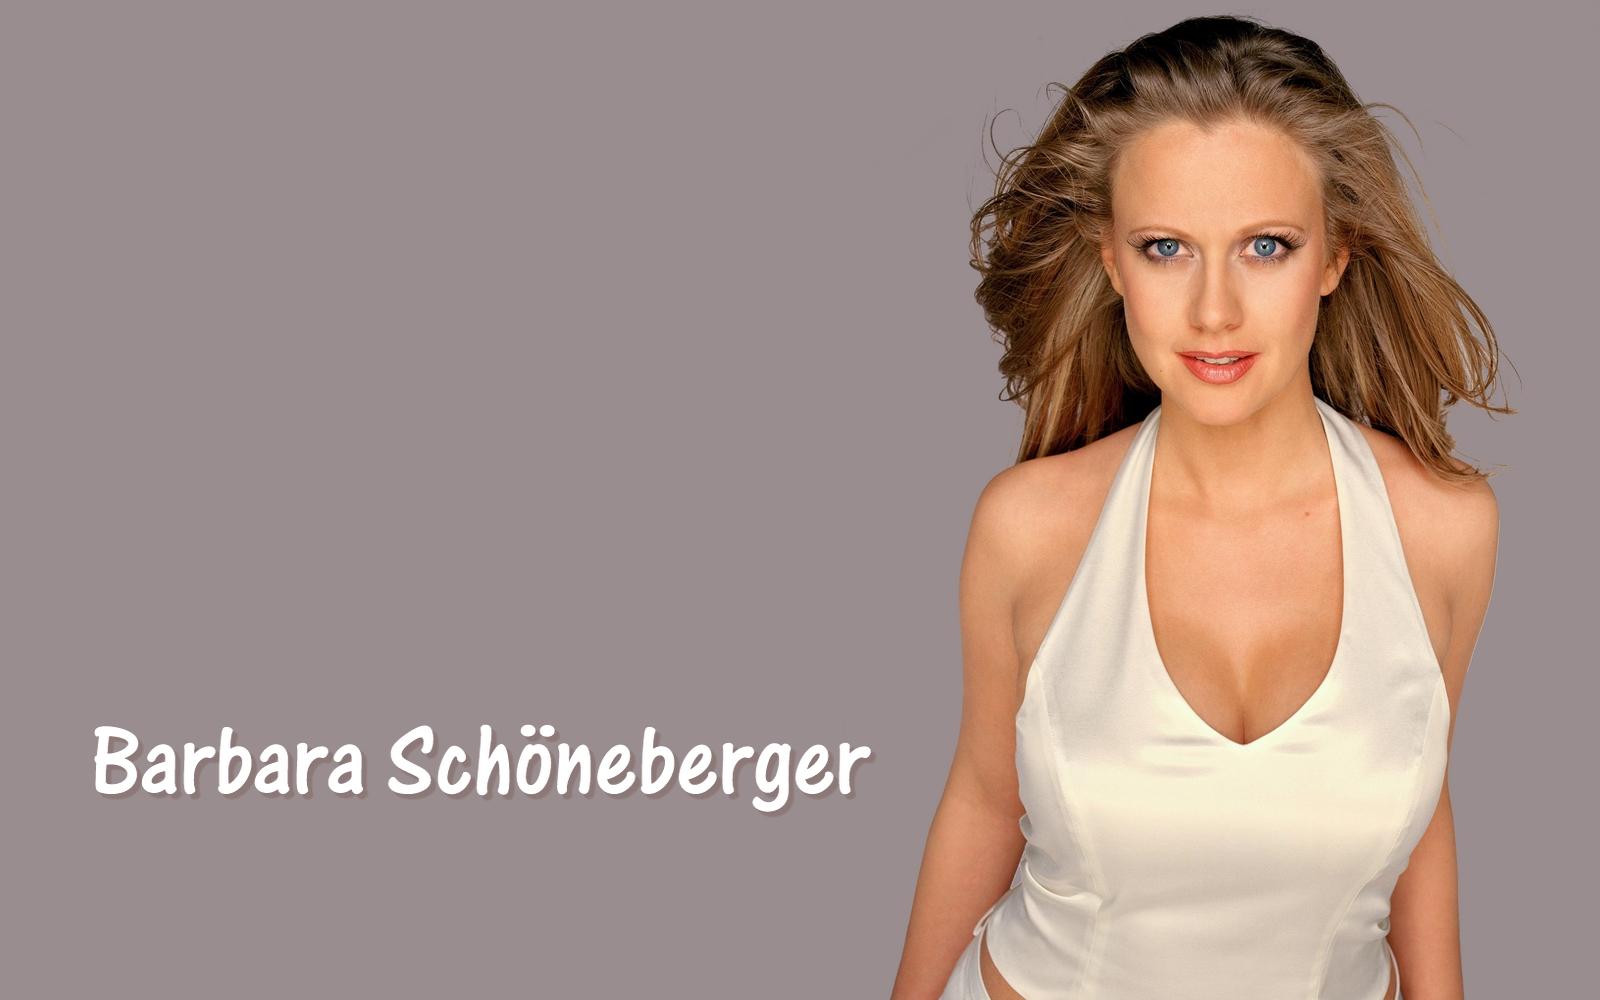 Nacktbilder barbara schoneberger picture 55